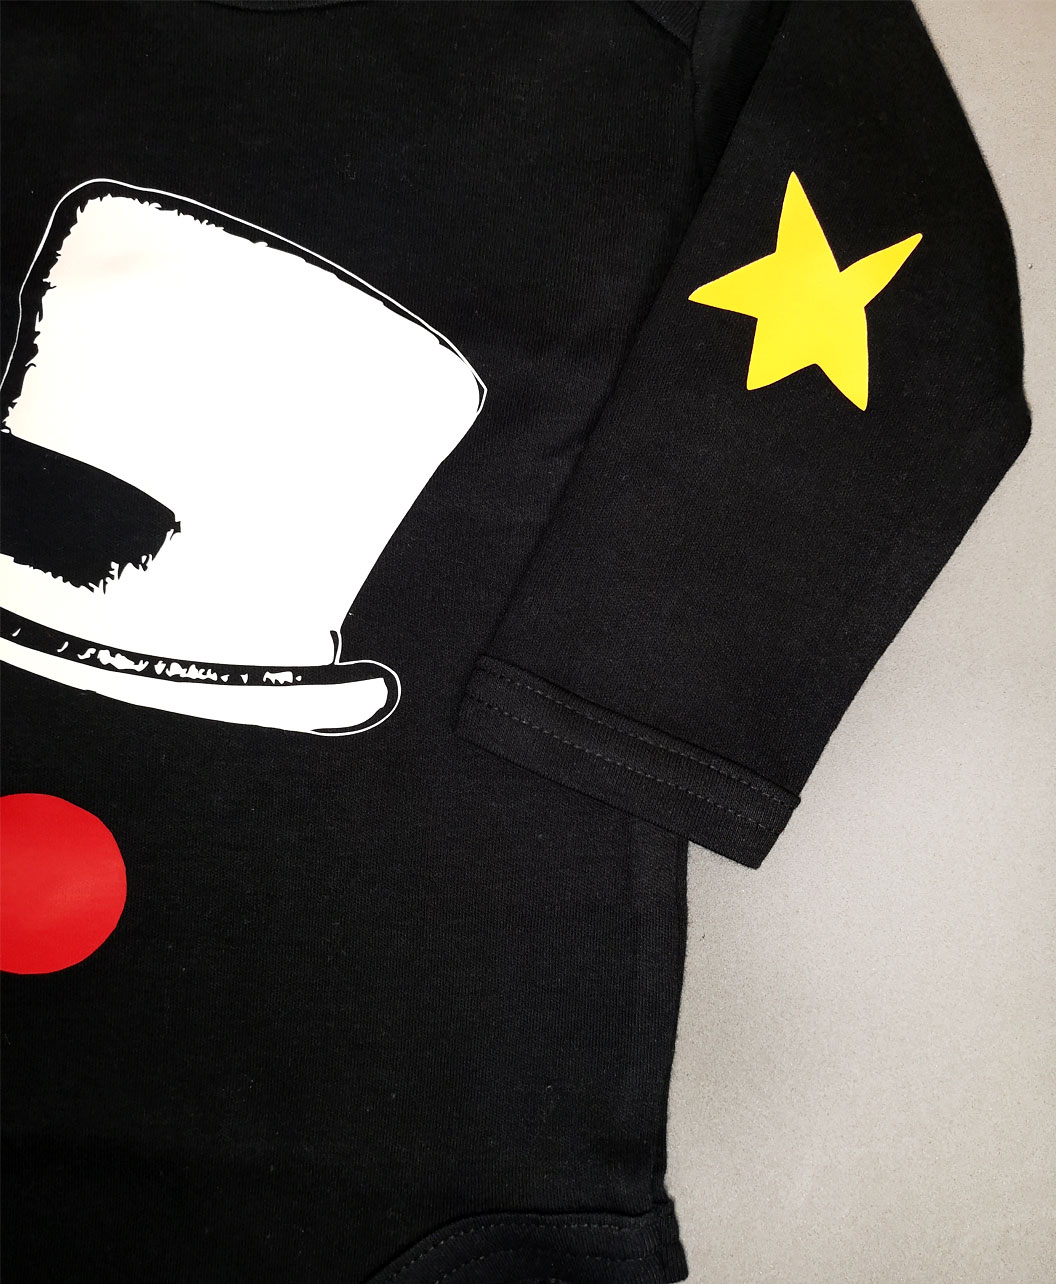 body bebe manga larga color negro algodon organico original diferente coderas circo sombrero nariz payaso